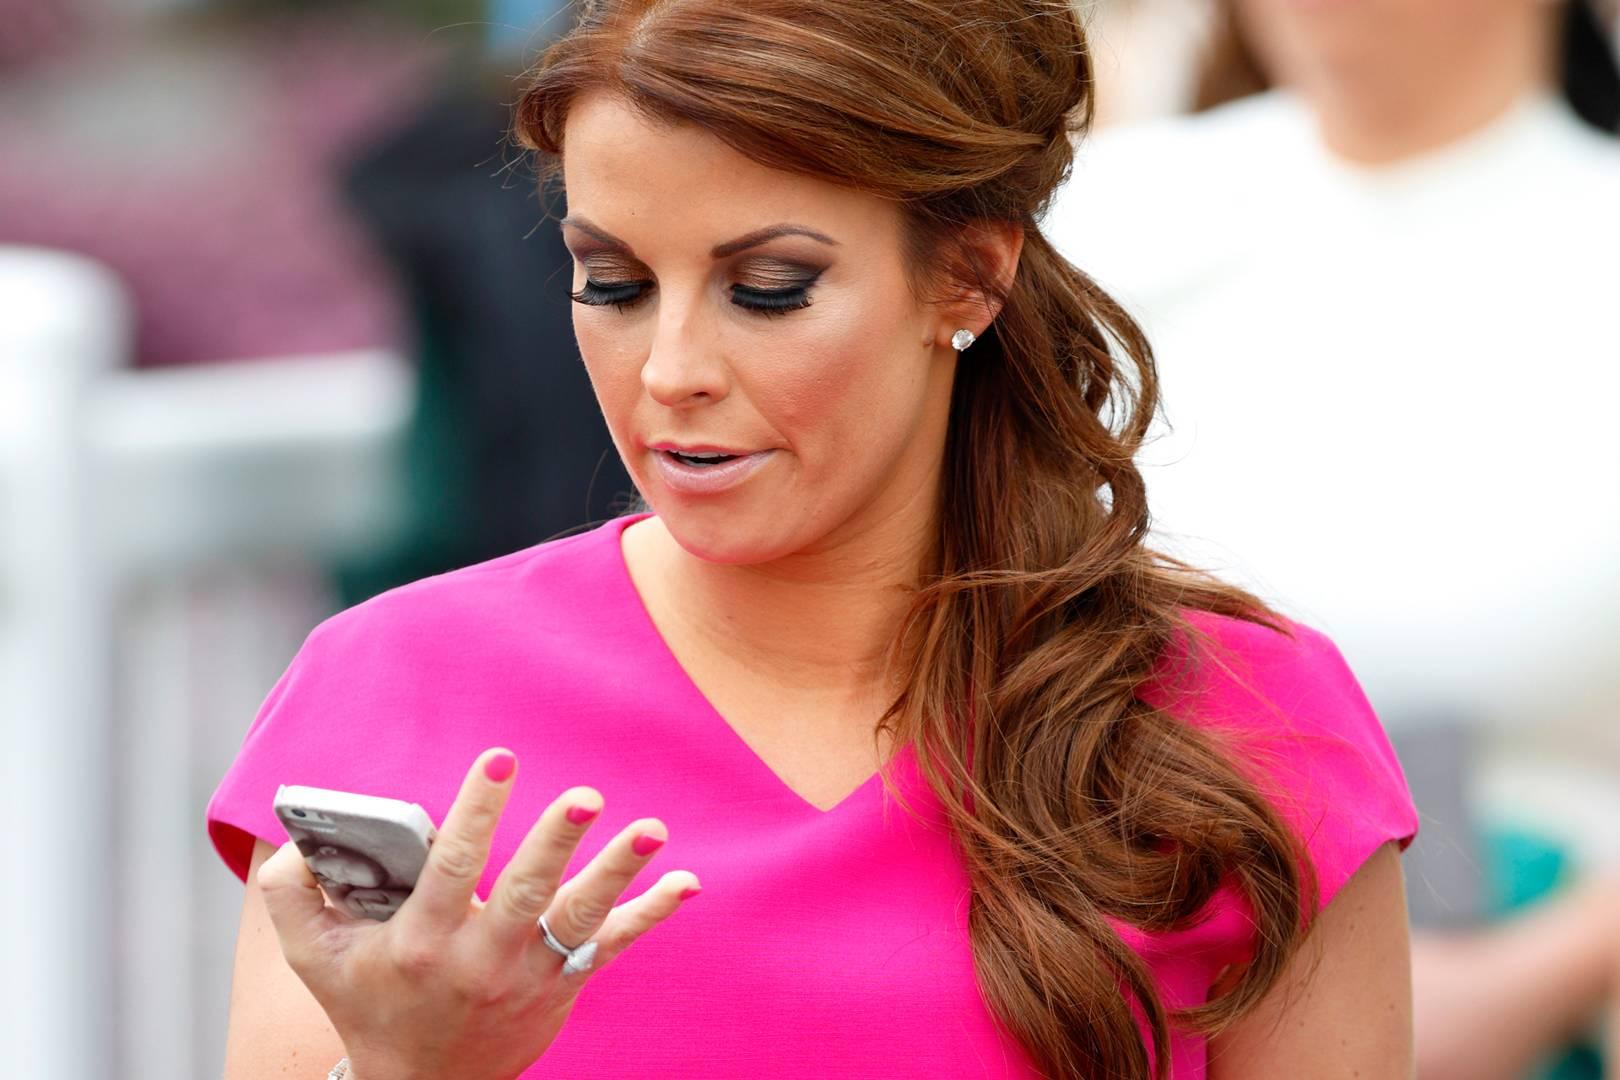 Coleen Rooney just schooled us all in social media opsec